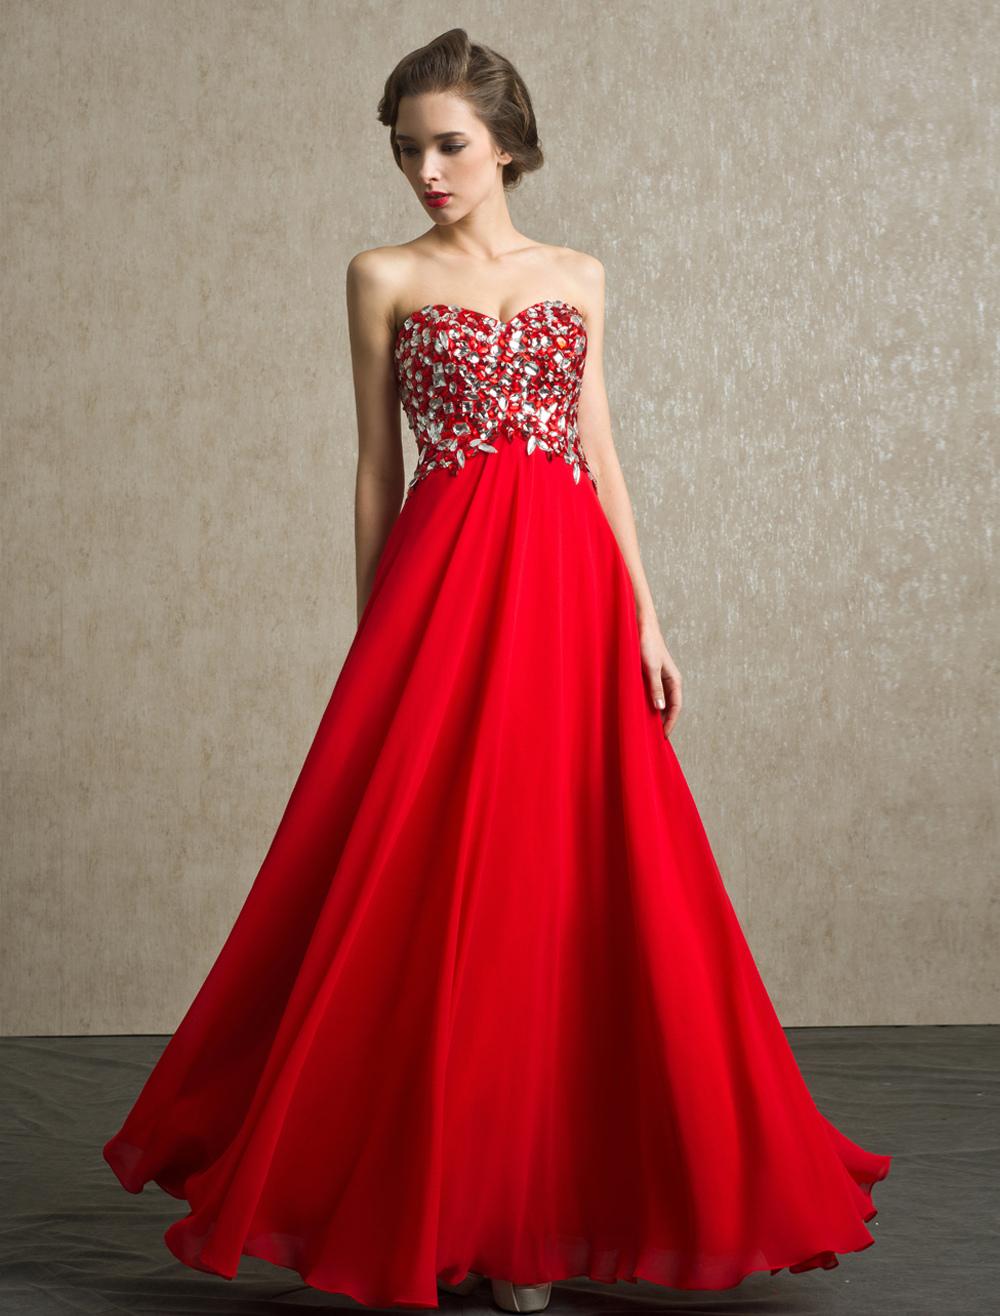 Red Prom Dresses 2018 Long Strapless Backless Evening Dress Rhinestone Chiffon Party Dress (Wedding) photo